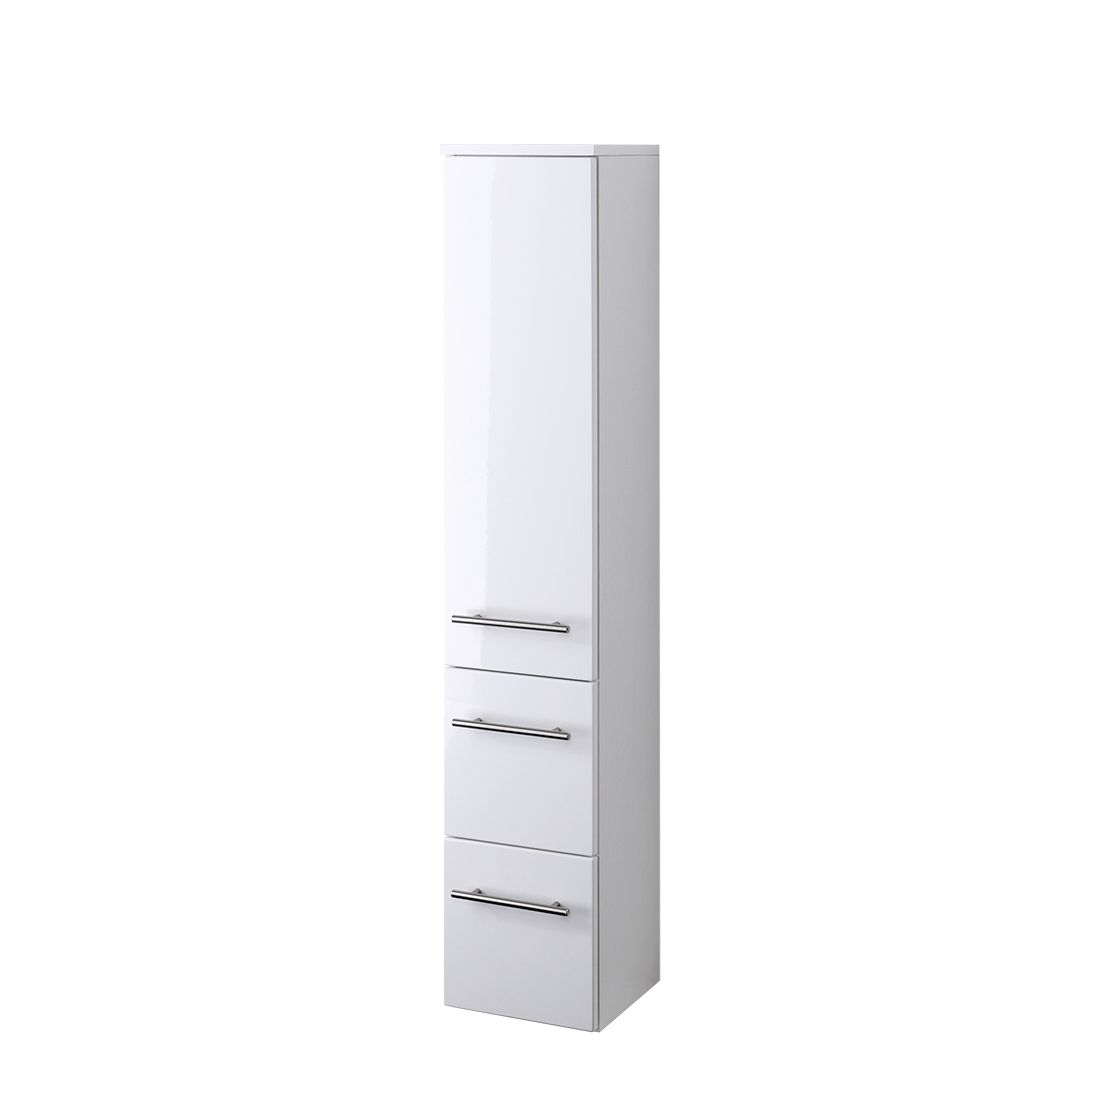 Armadietto da bagno Kopenhagen - Bianco lucido/Bianco - 25 cm, Giessbach